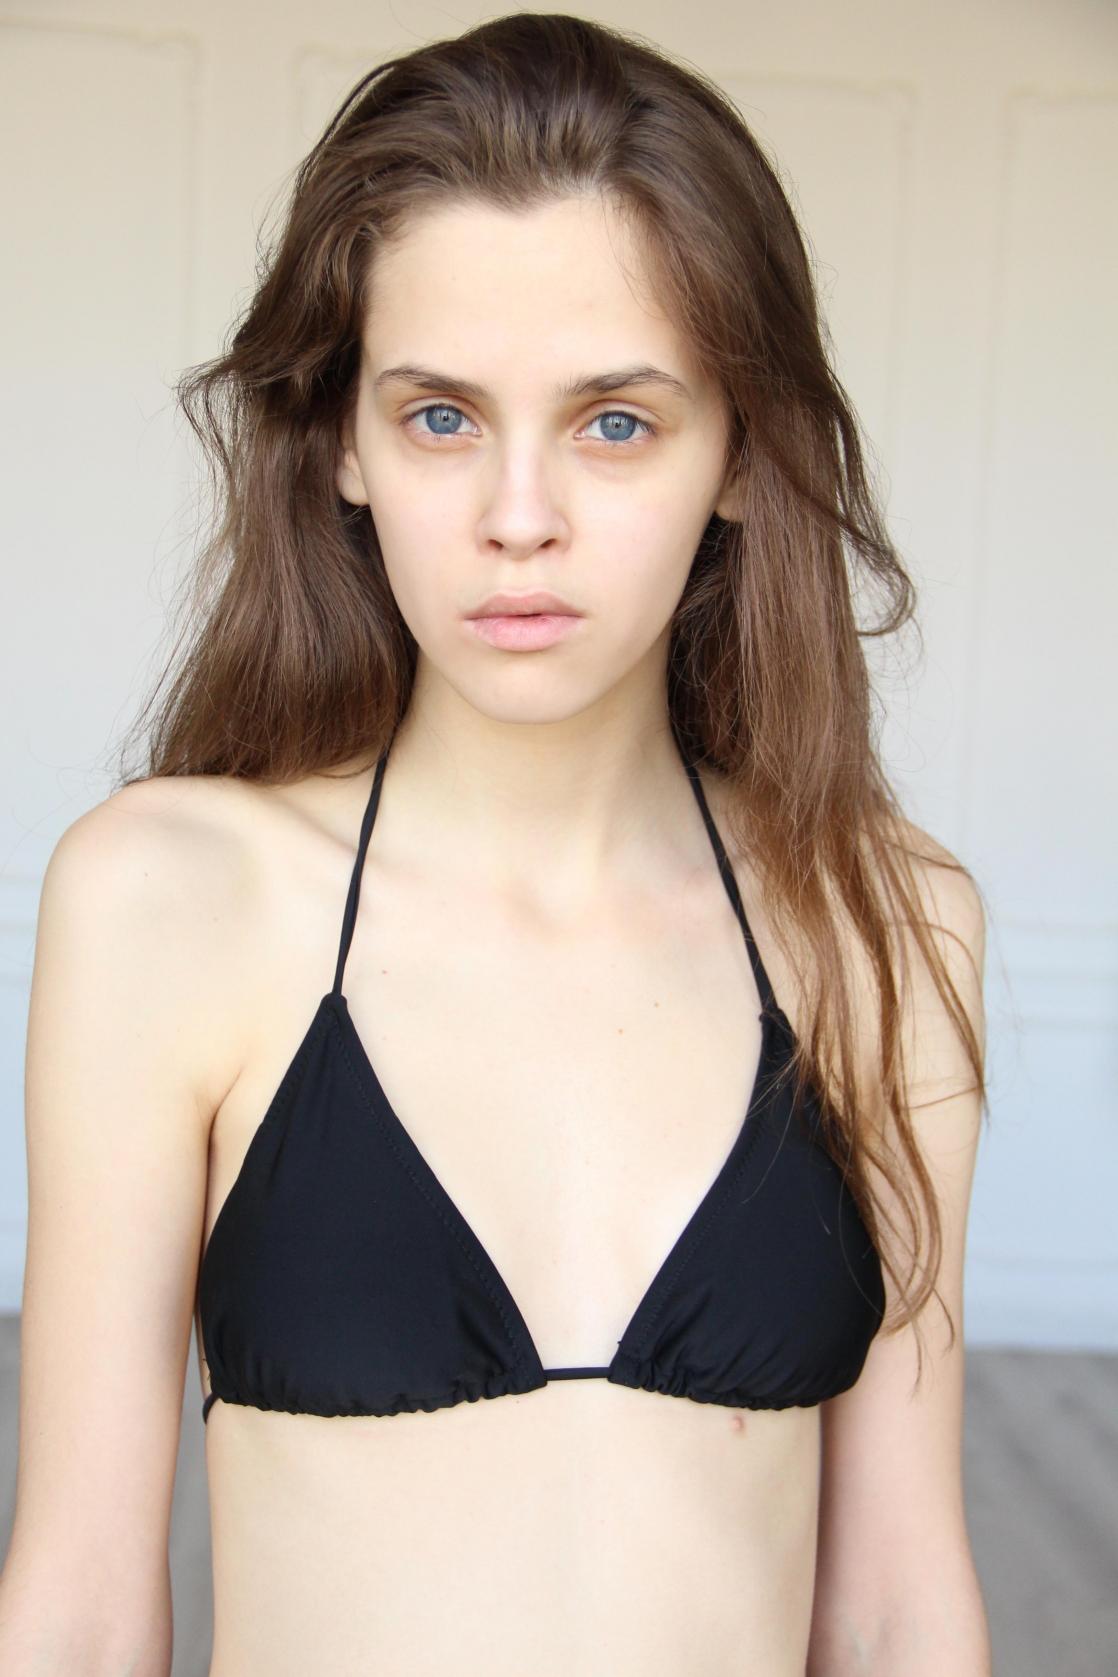 Dasha Ponomareva in a bikini